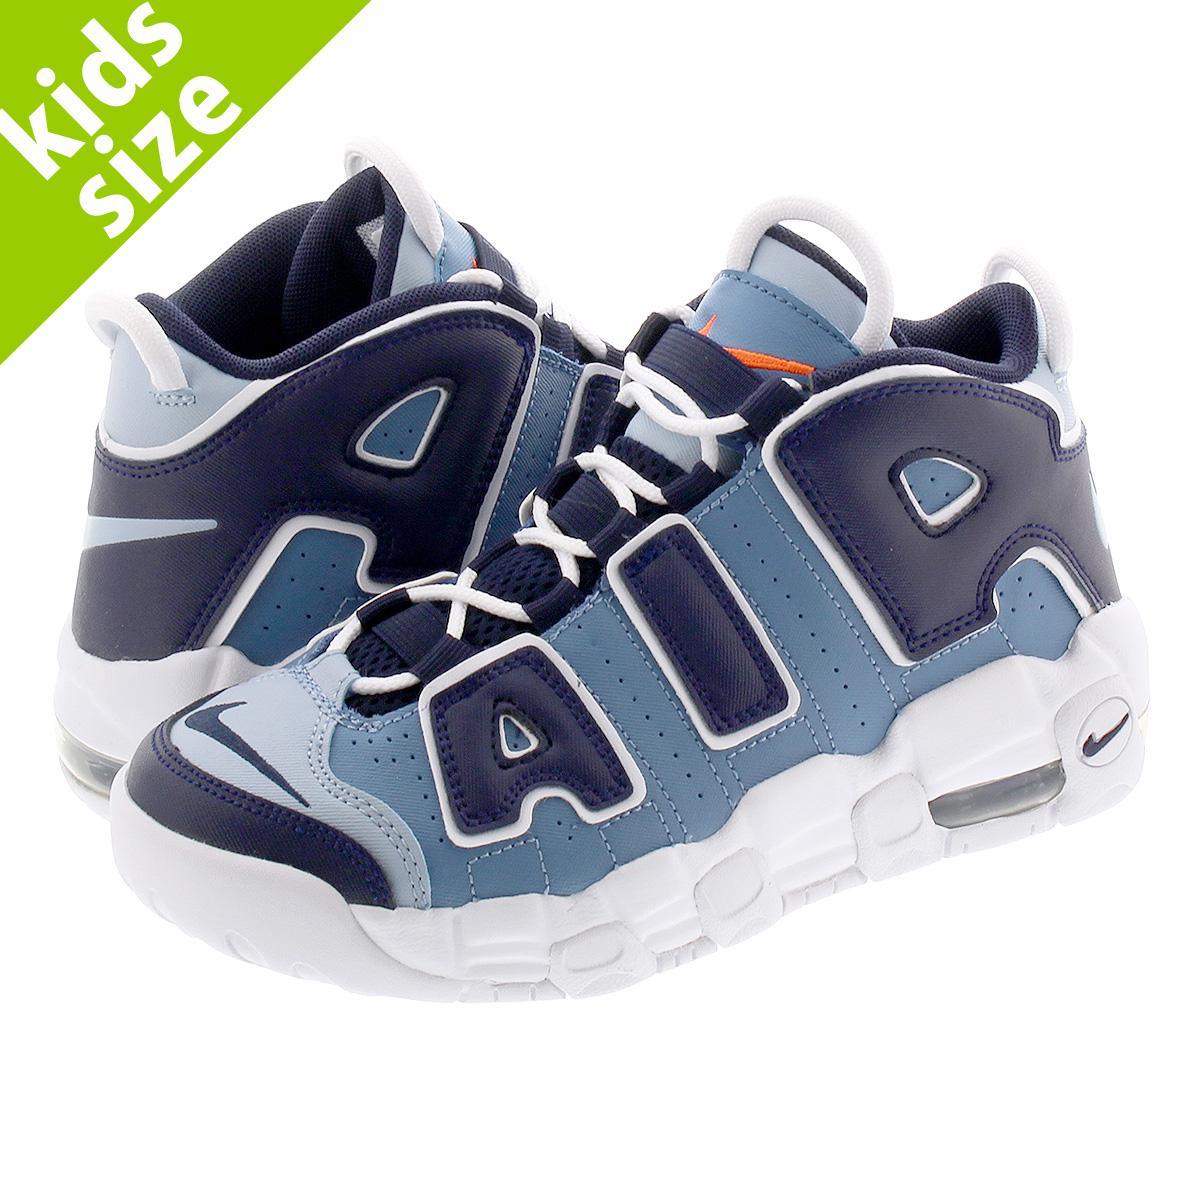 Nike Air More Uptempo Big Kids' Shoe (Ocean Fog)   Nike air